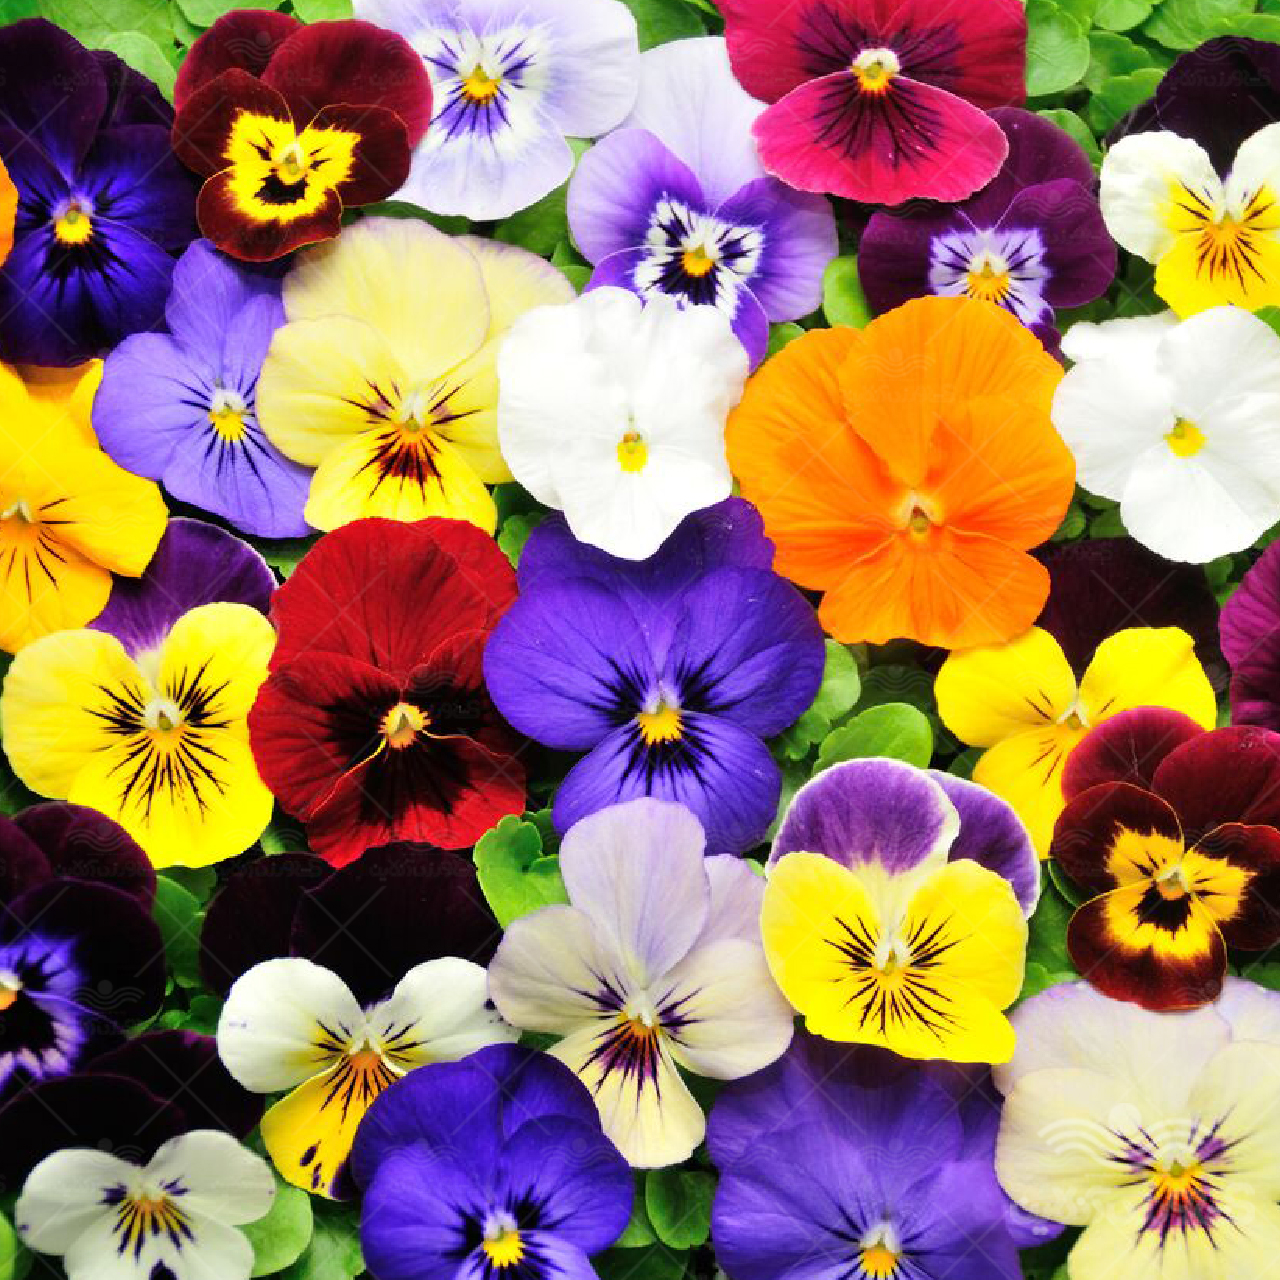 بذر گل بنفشه الوان میکس